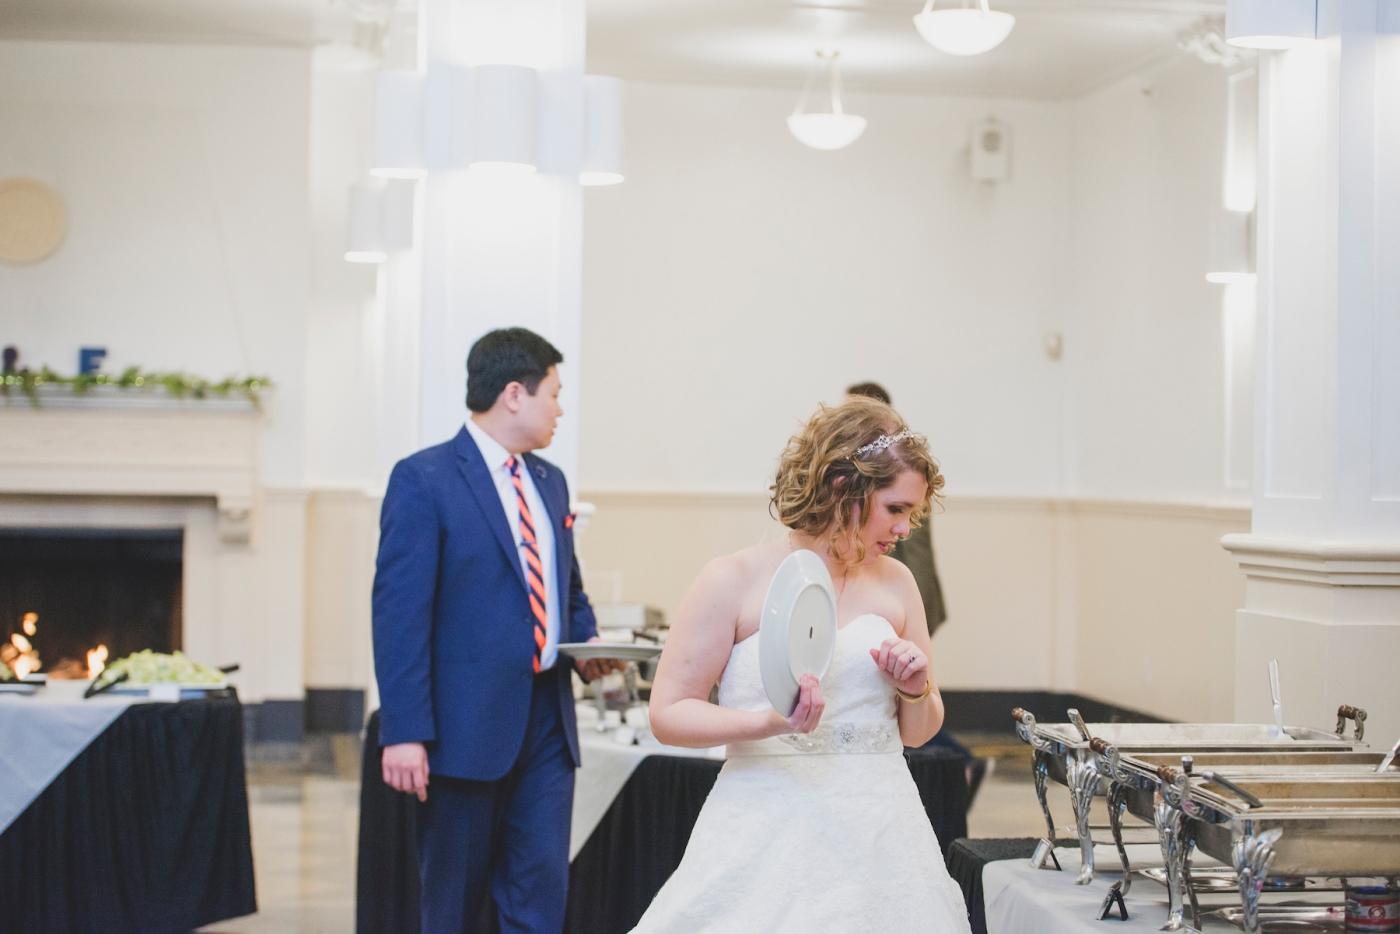 DSC_3169Everett_Wedding_Ballroom_Jane_Speleers_photography_Rachel_and_Edmund_reception_2017